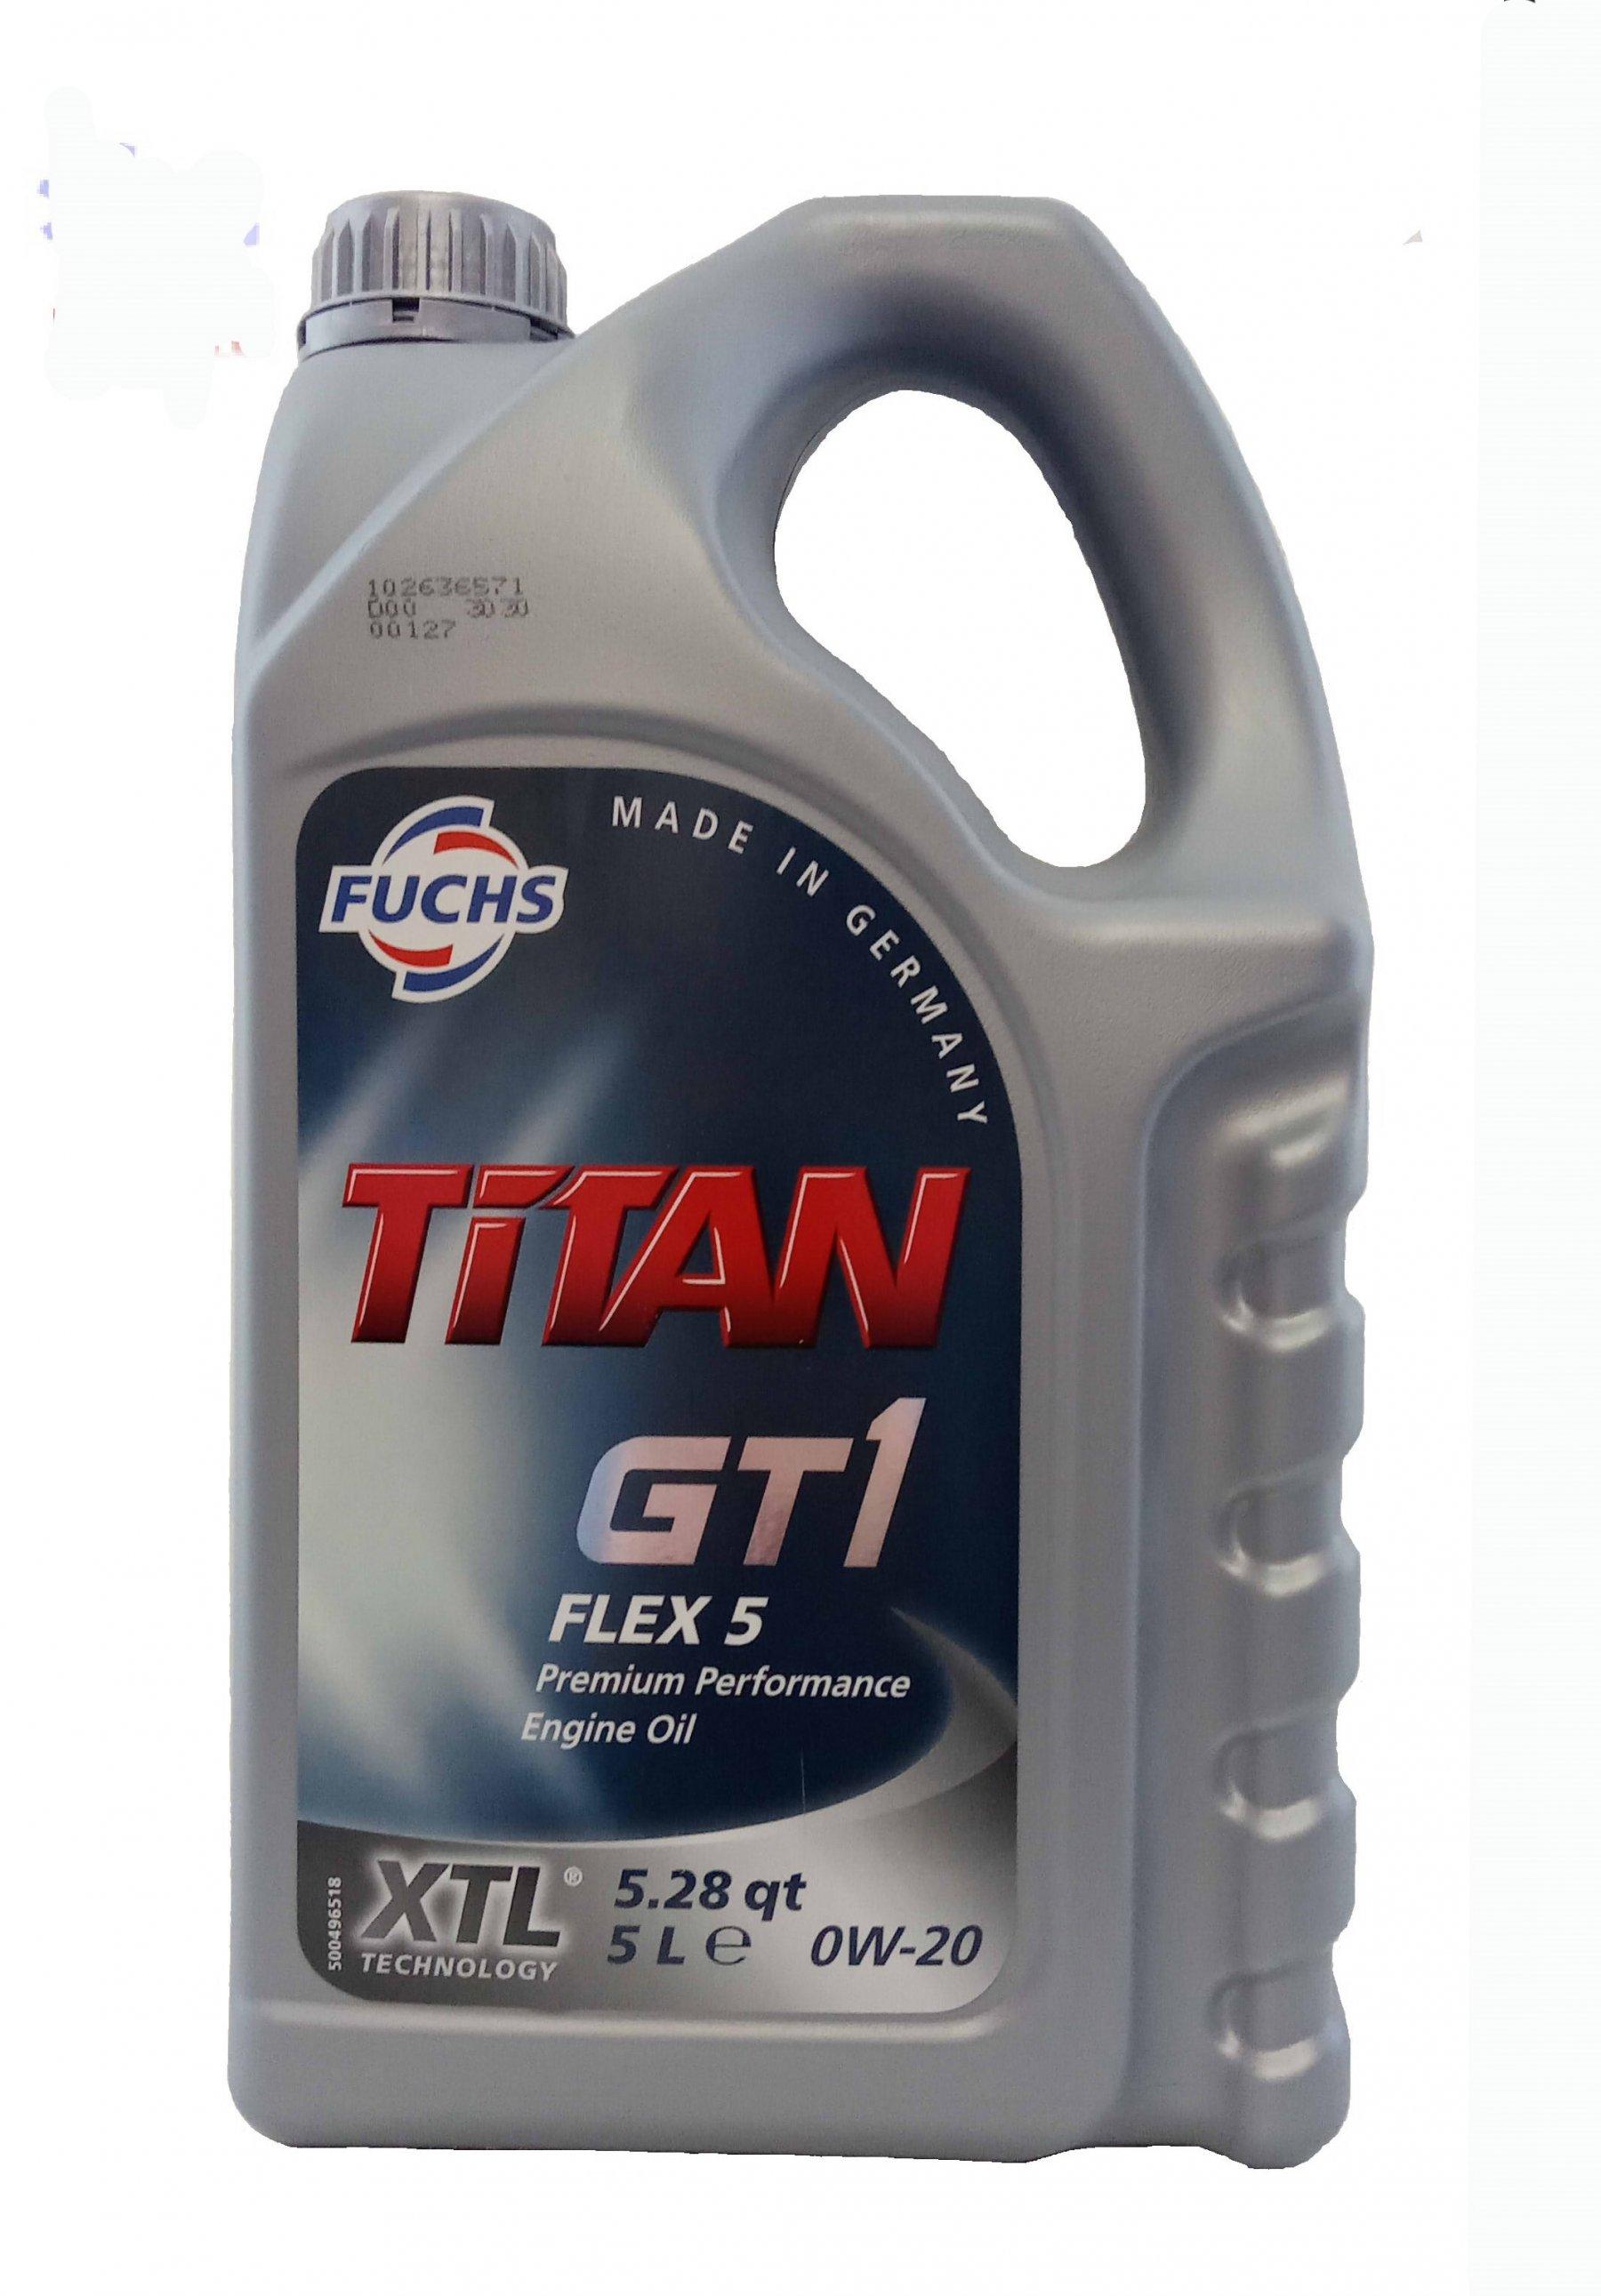 Fuchs Titan GT1 FLEX 5 0w-20 5 л